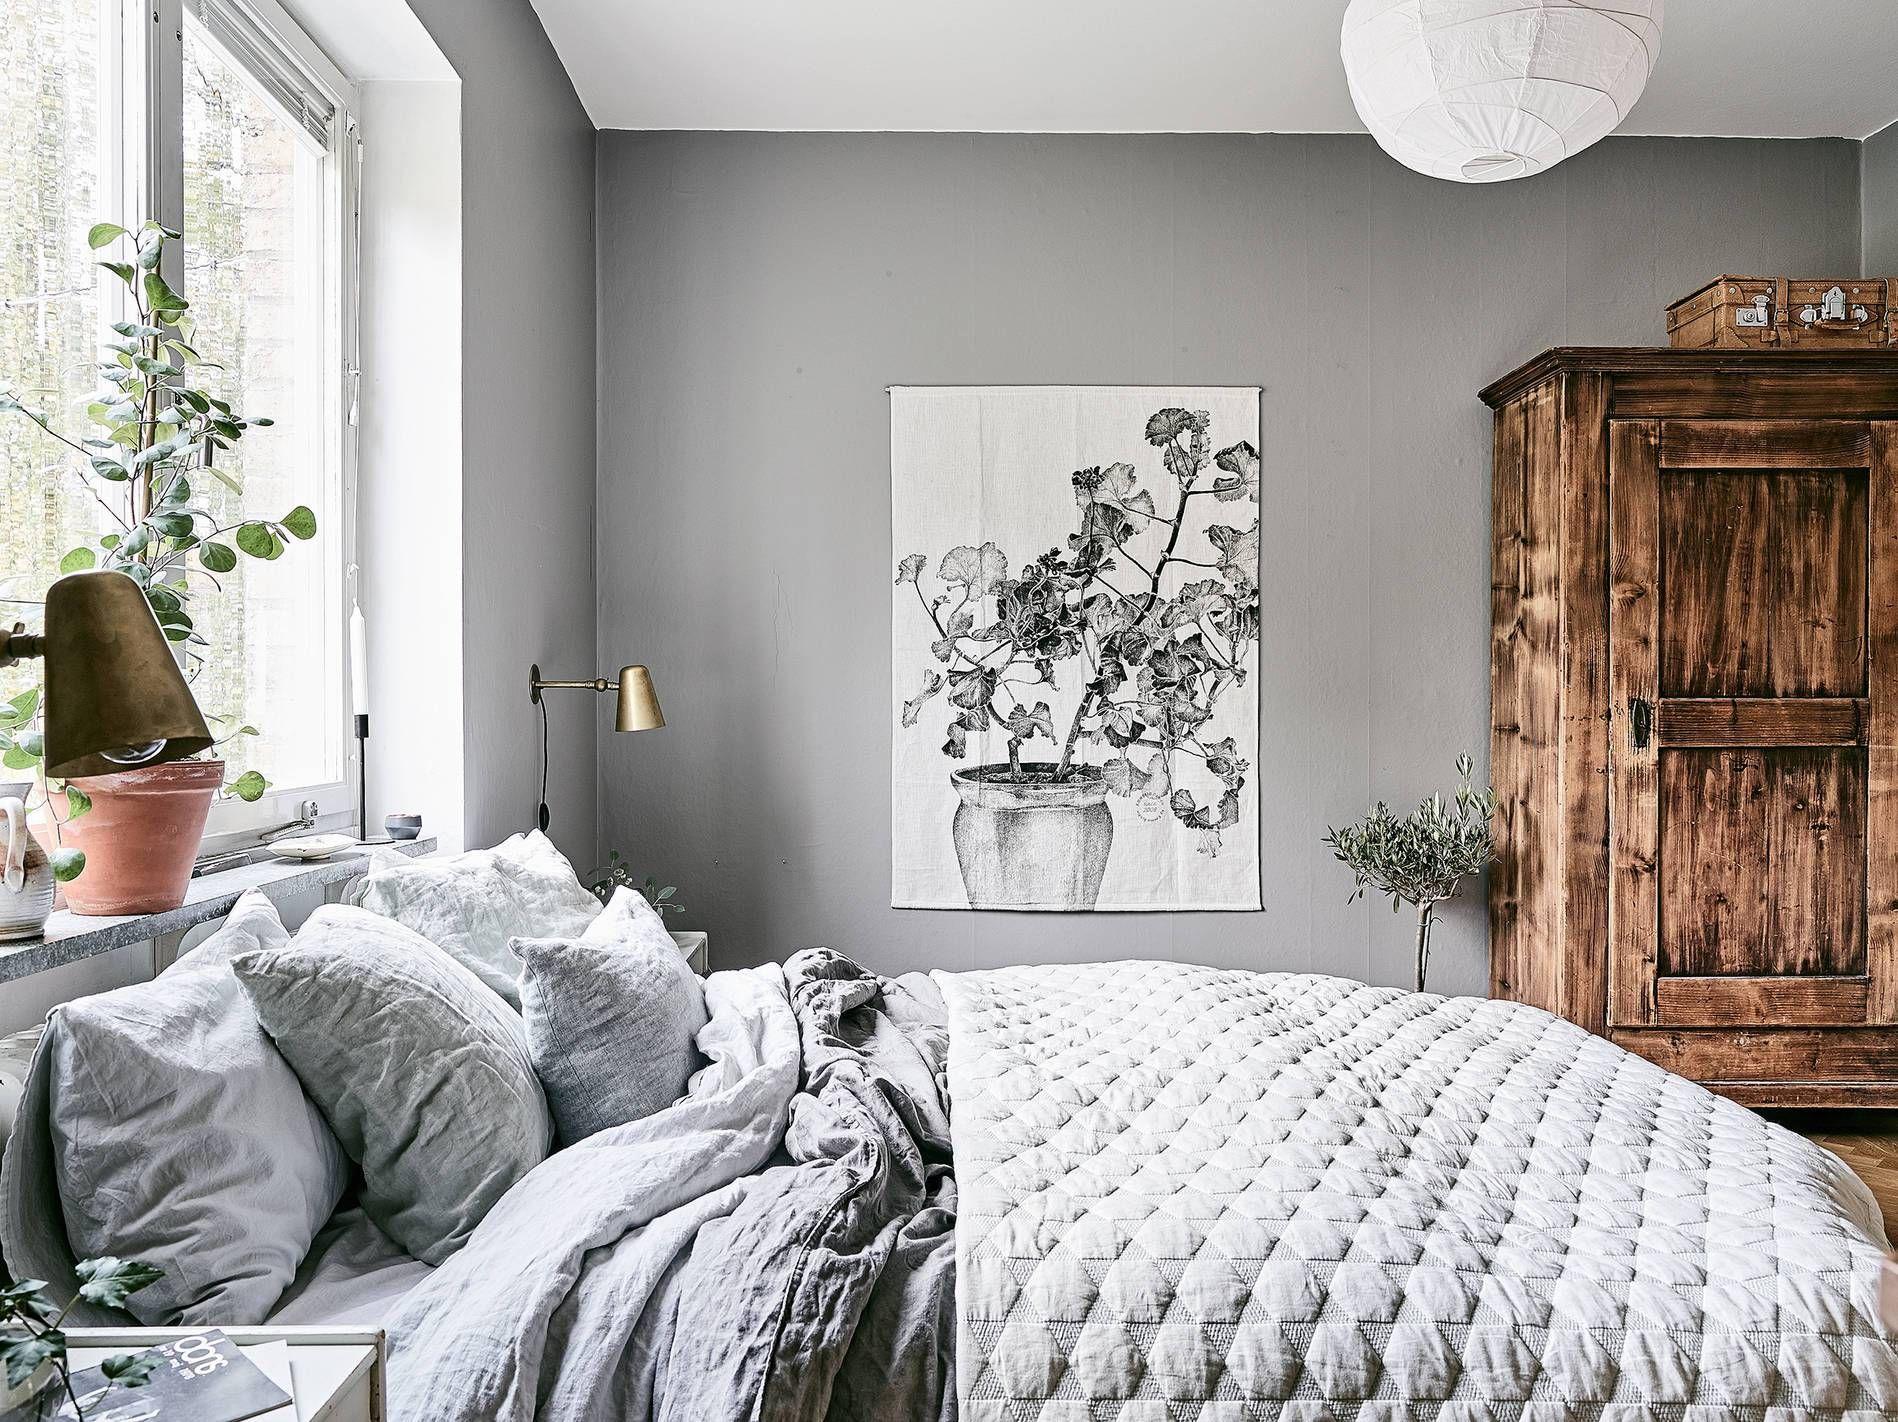 cozy bedroom in grey residential interiors cozy. Black Bedroom Furniture Sets. Home Design Ideas